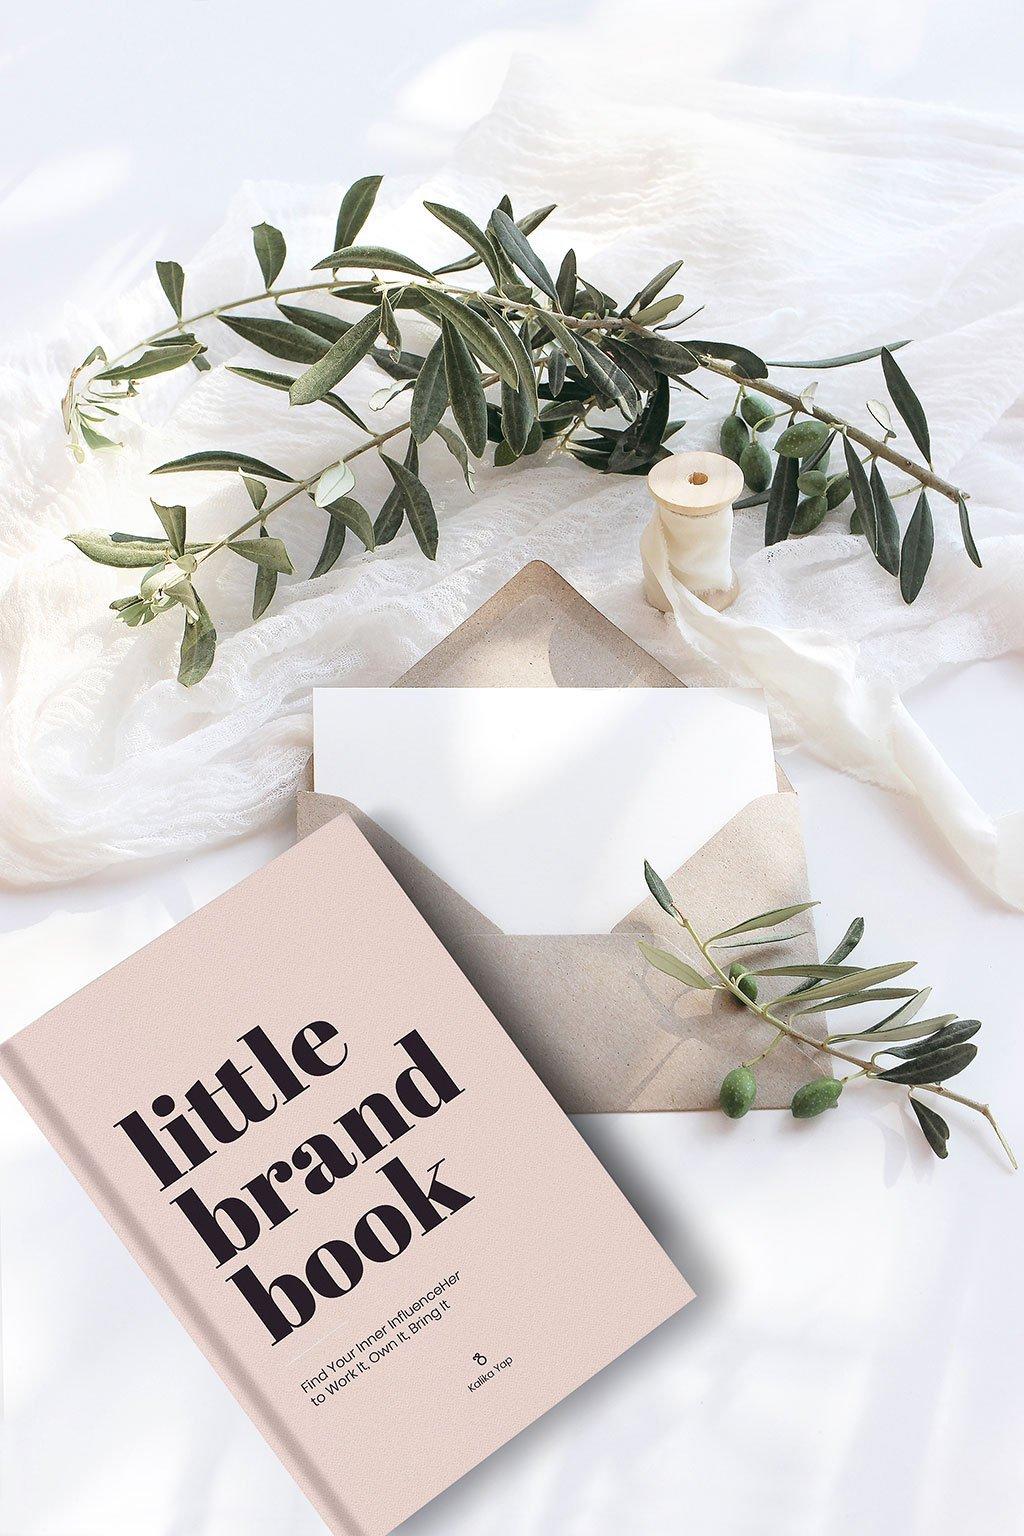 Little brand book has been featured on Kalika Yap blog